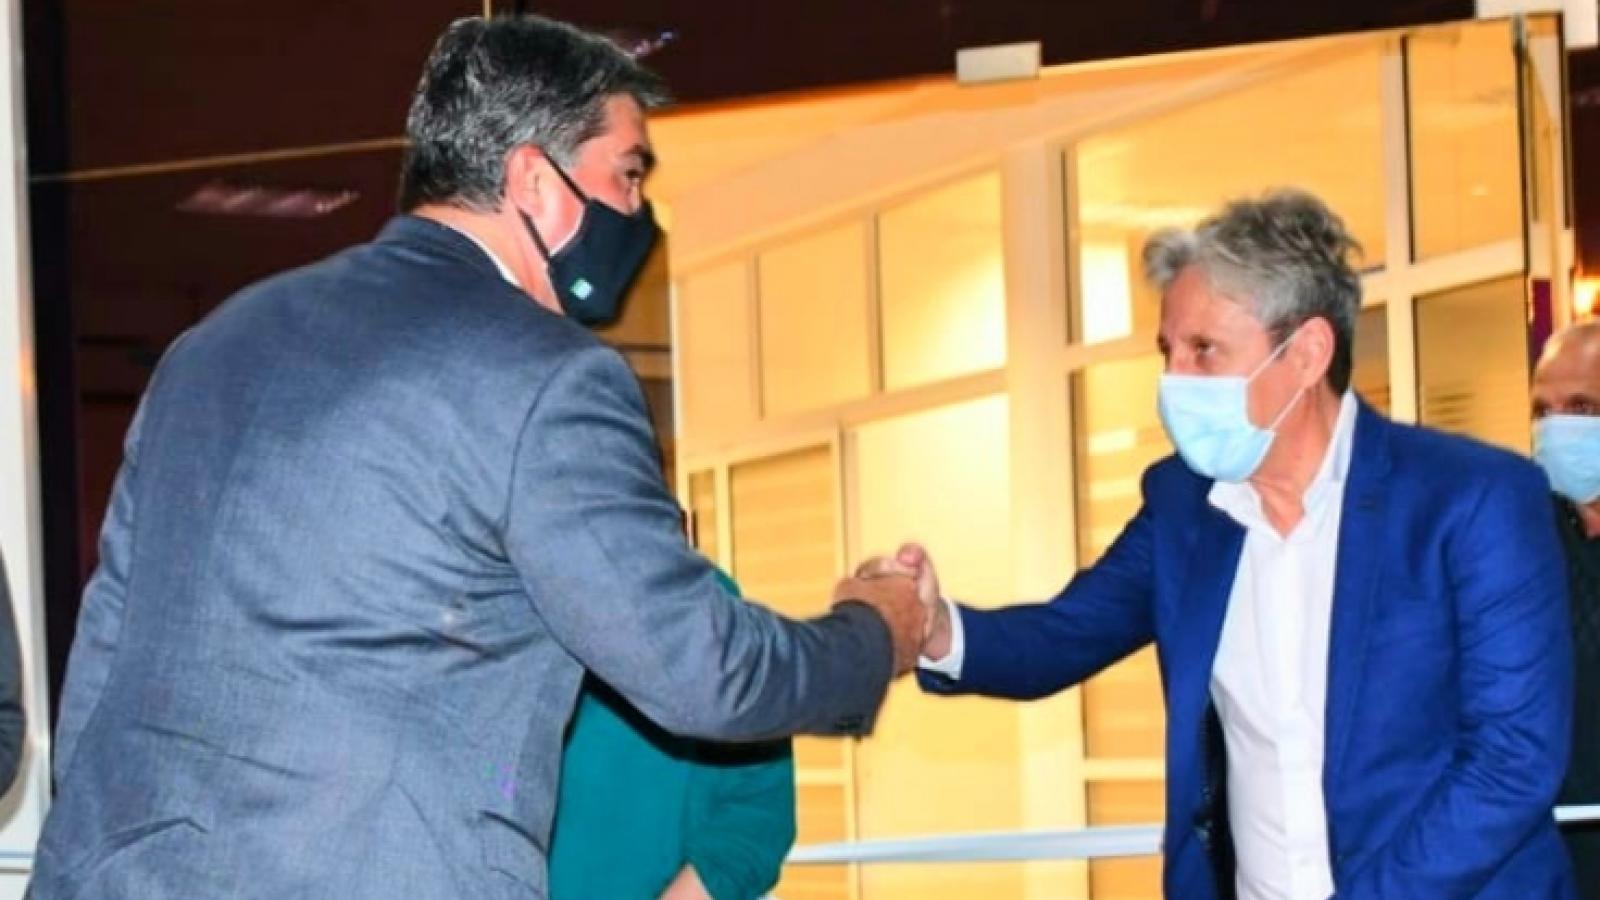 Presidente Lorenzo choca puños con el gobernador Capitanich